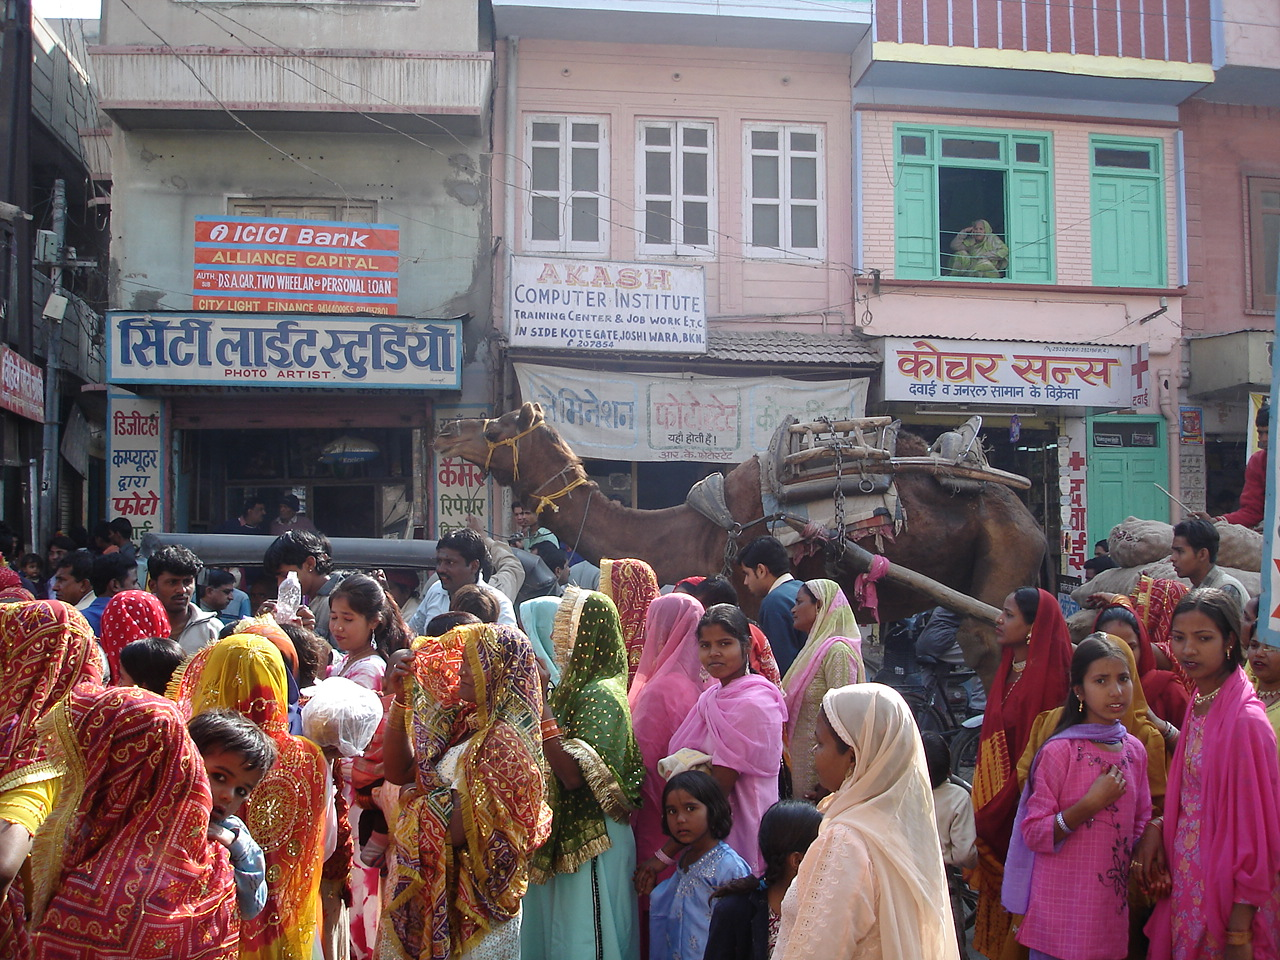 Bikaner, Rajasthan  photo by Wendy Kubiak